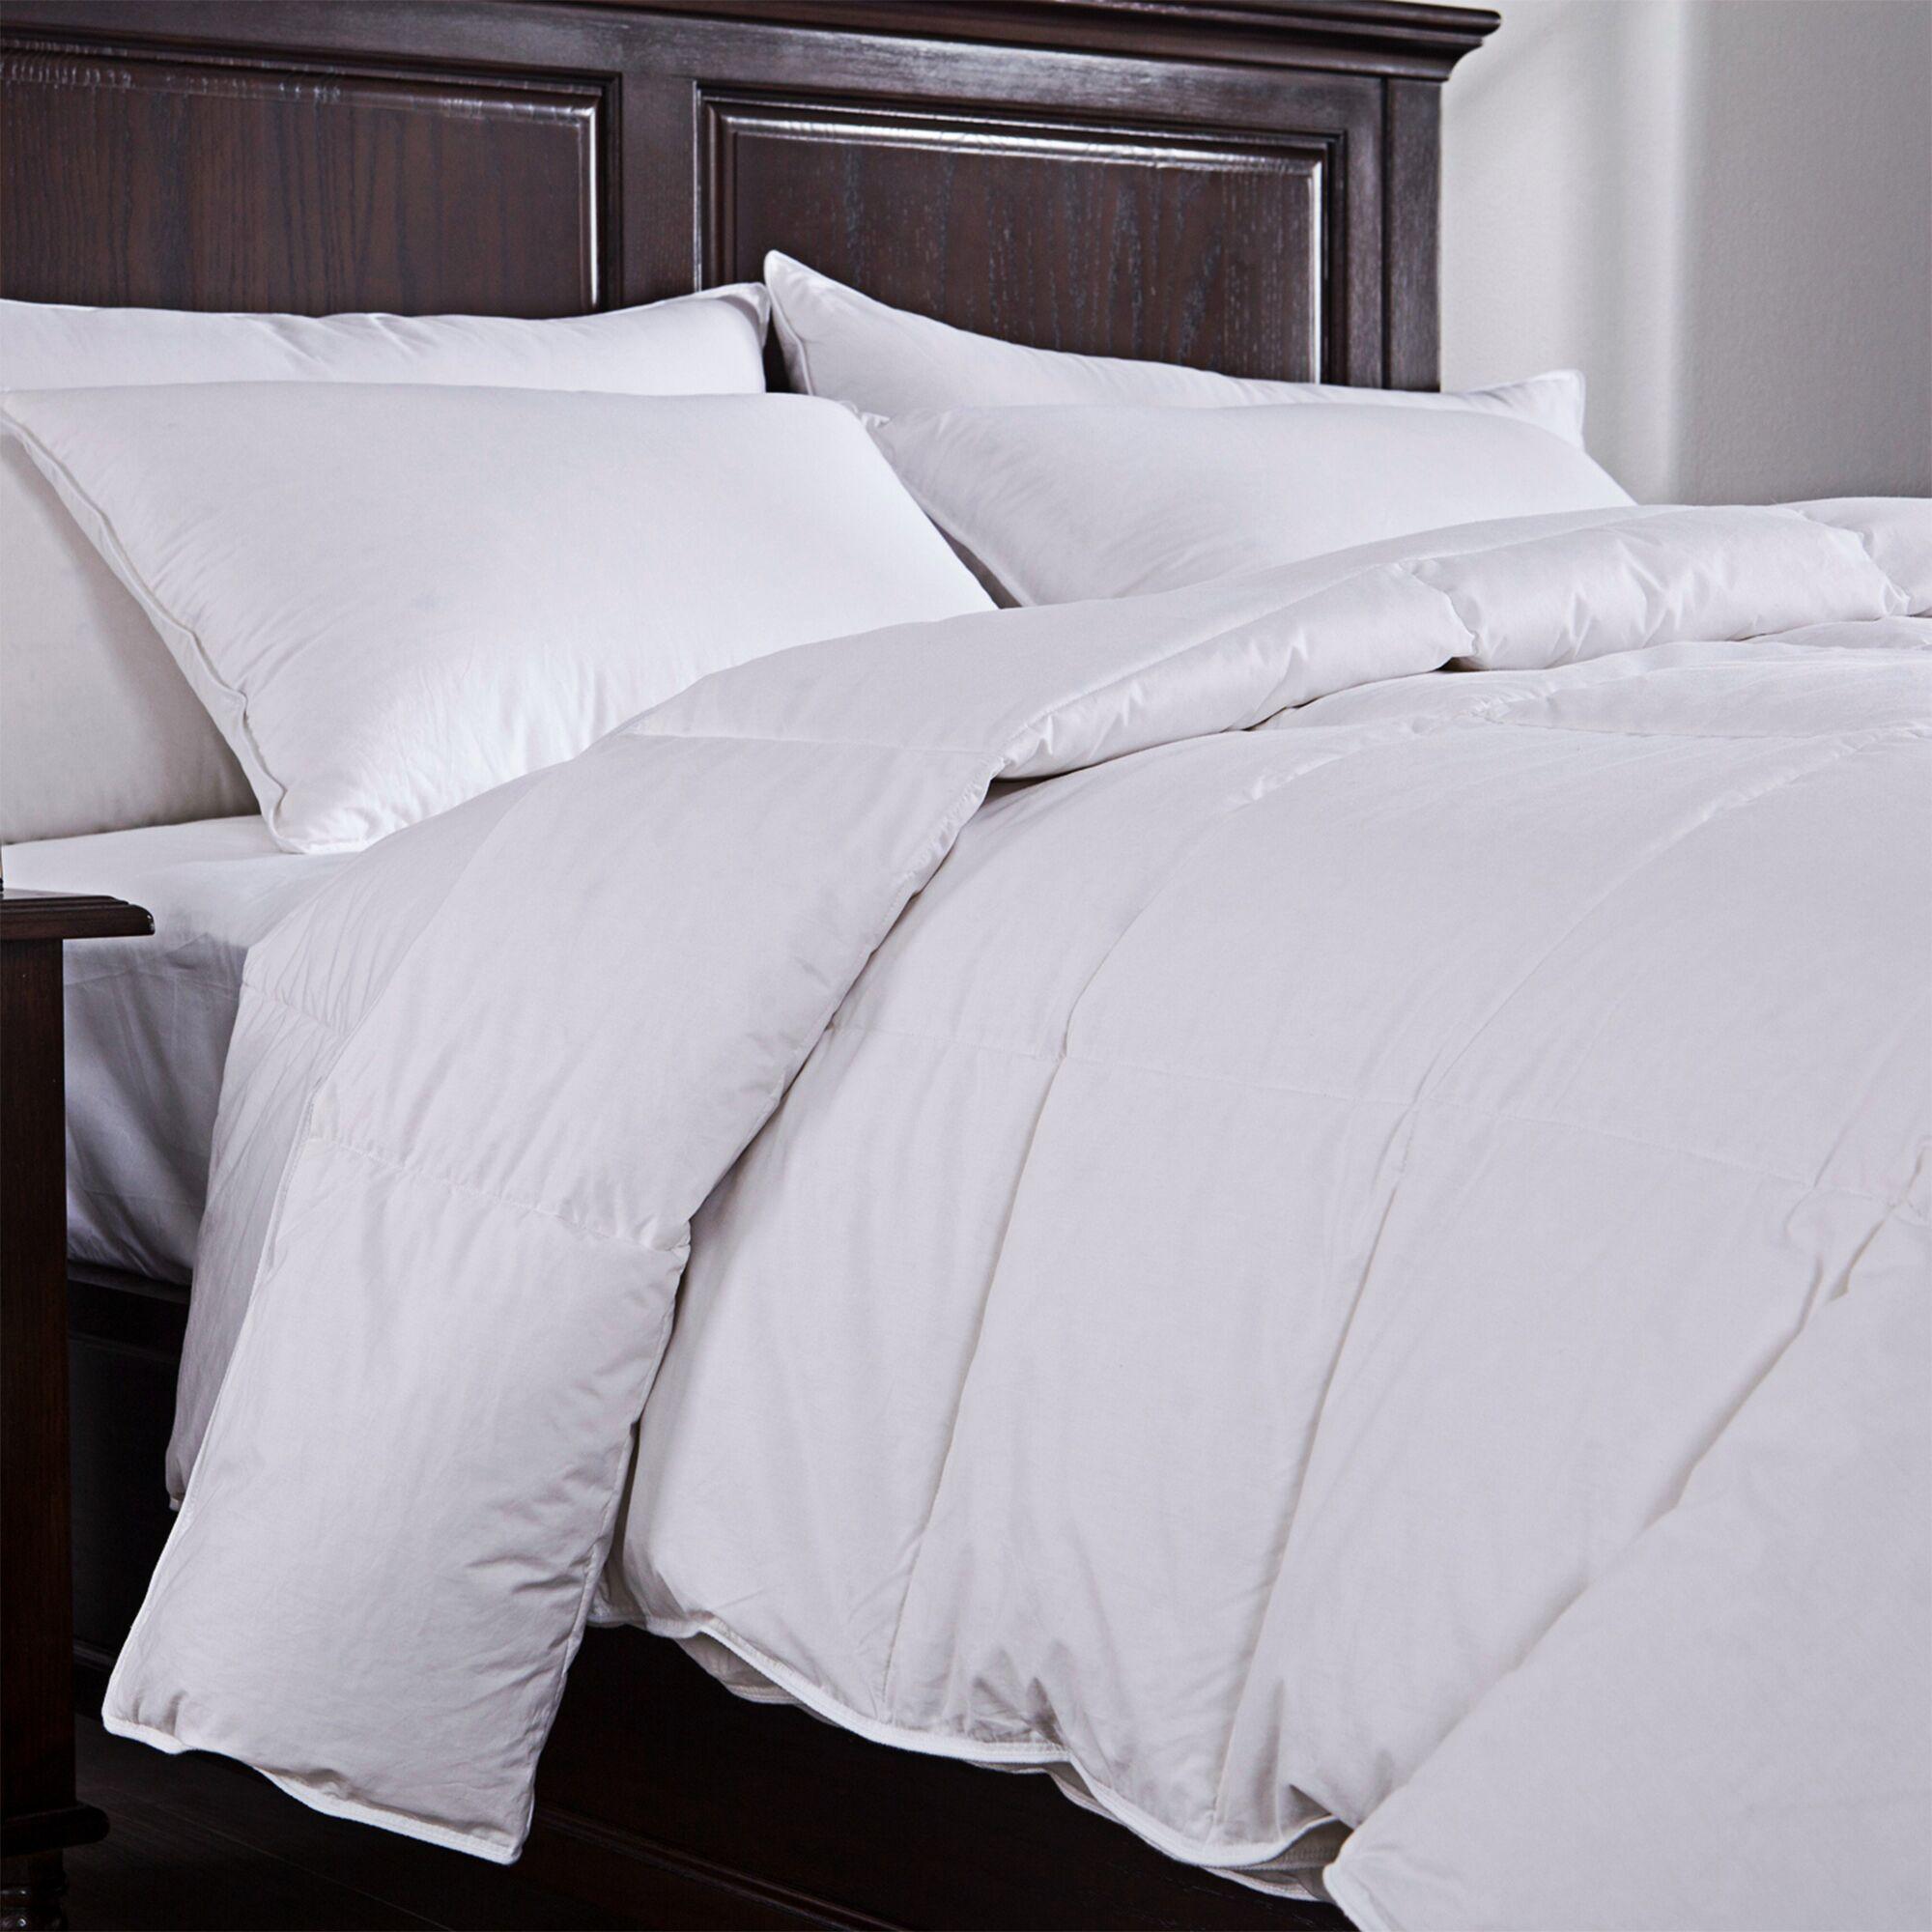 Lightweight Down Comforter Size: Full / Queen